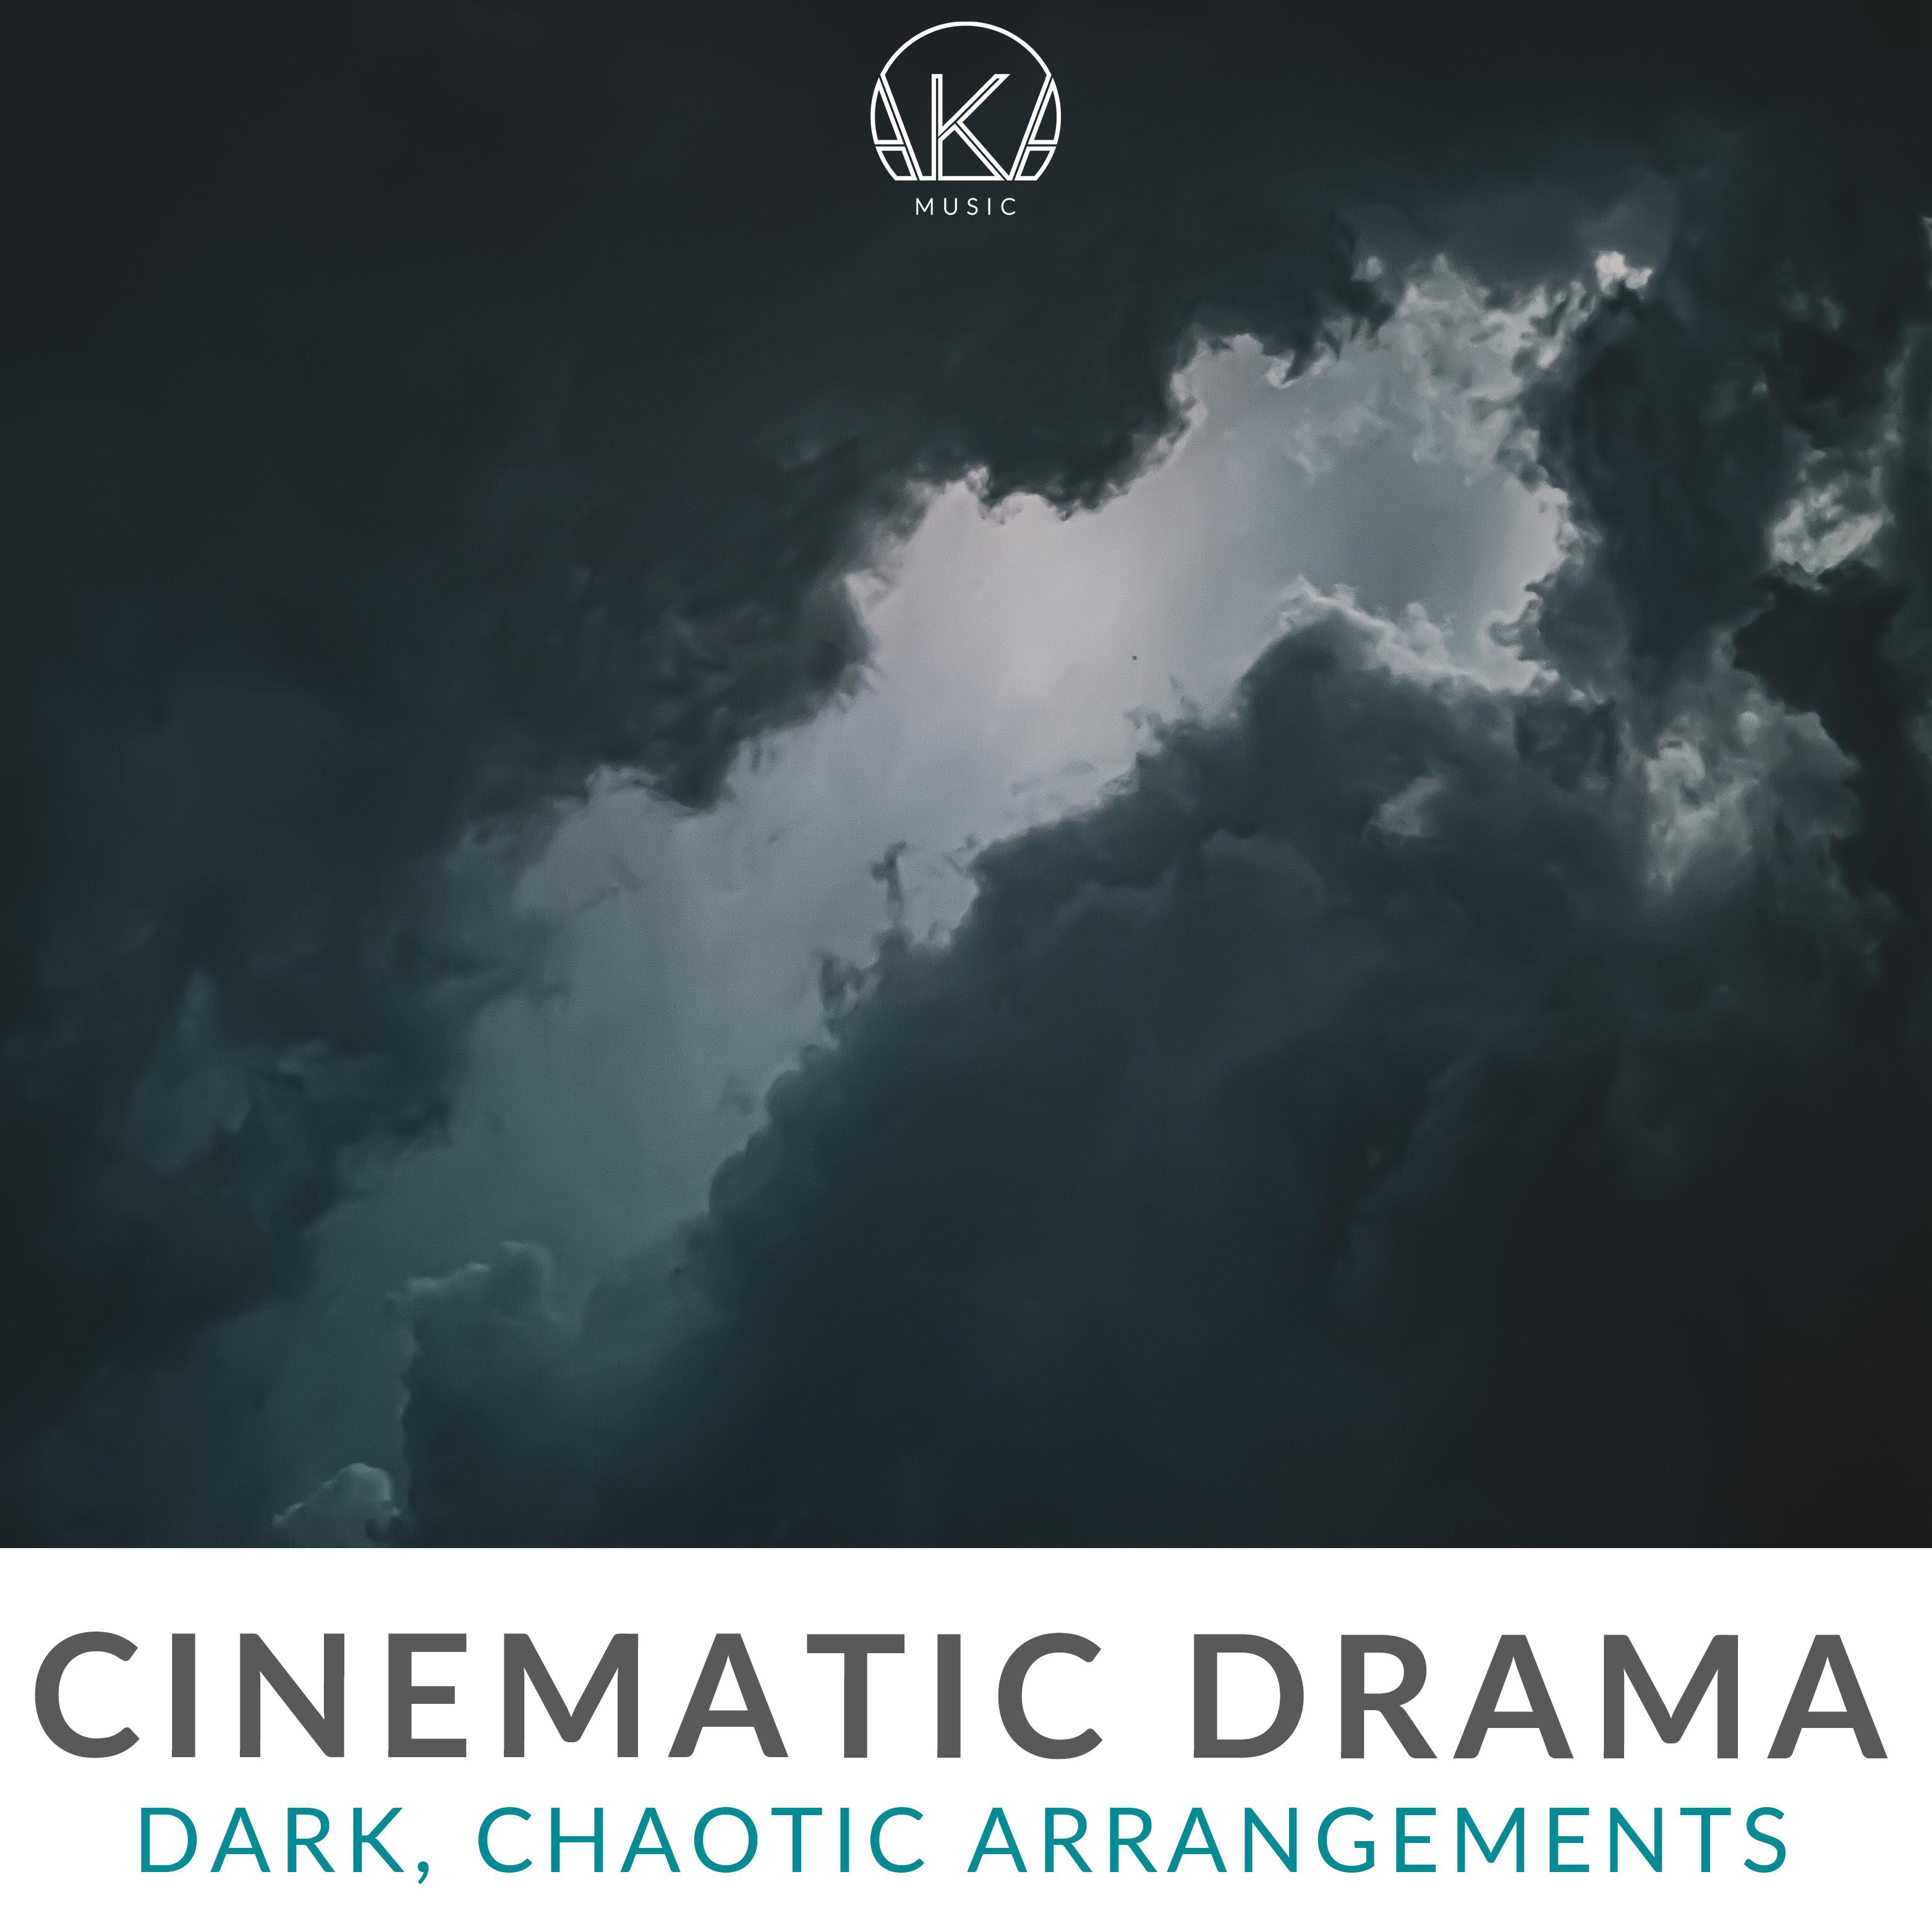 AKA031 Cinematic Drama